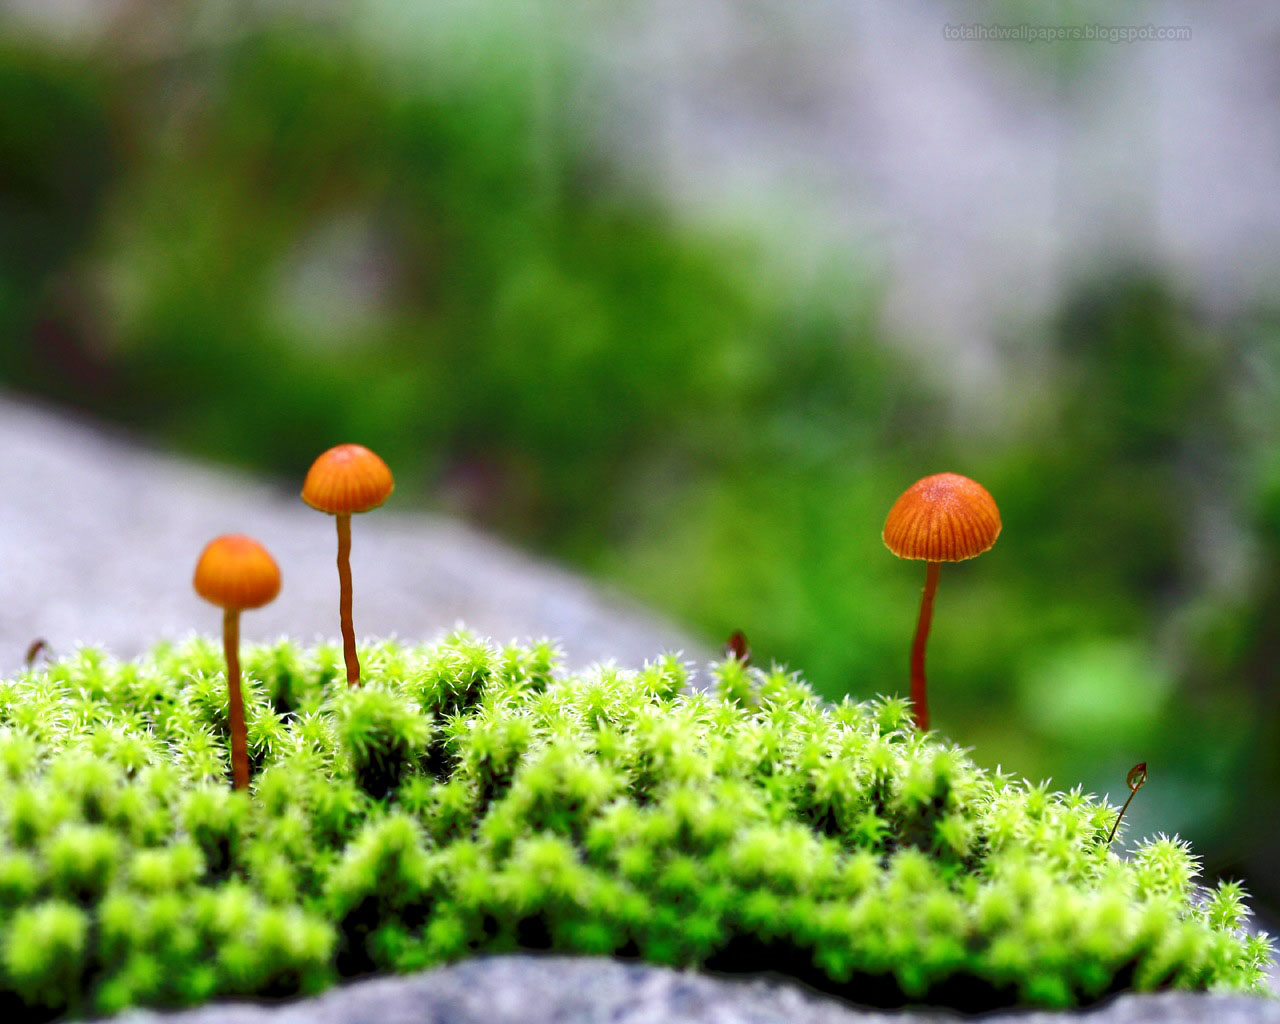 HD Wallpapers: Mushroom wallpapers hd